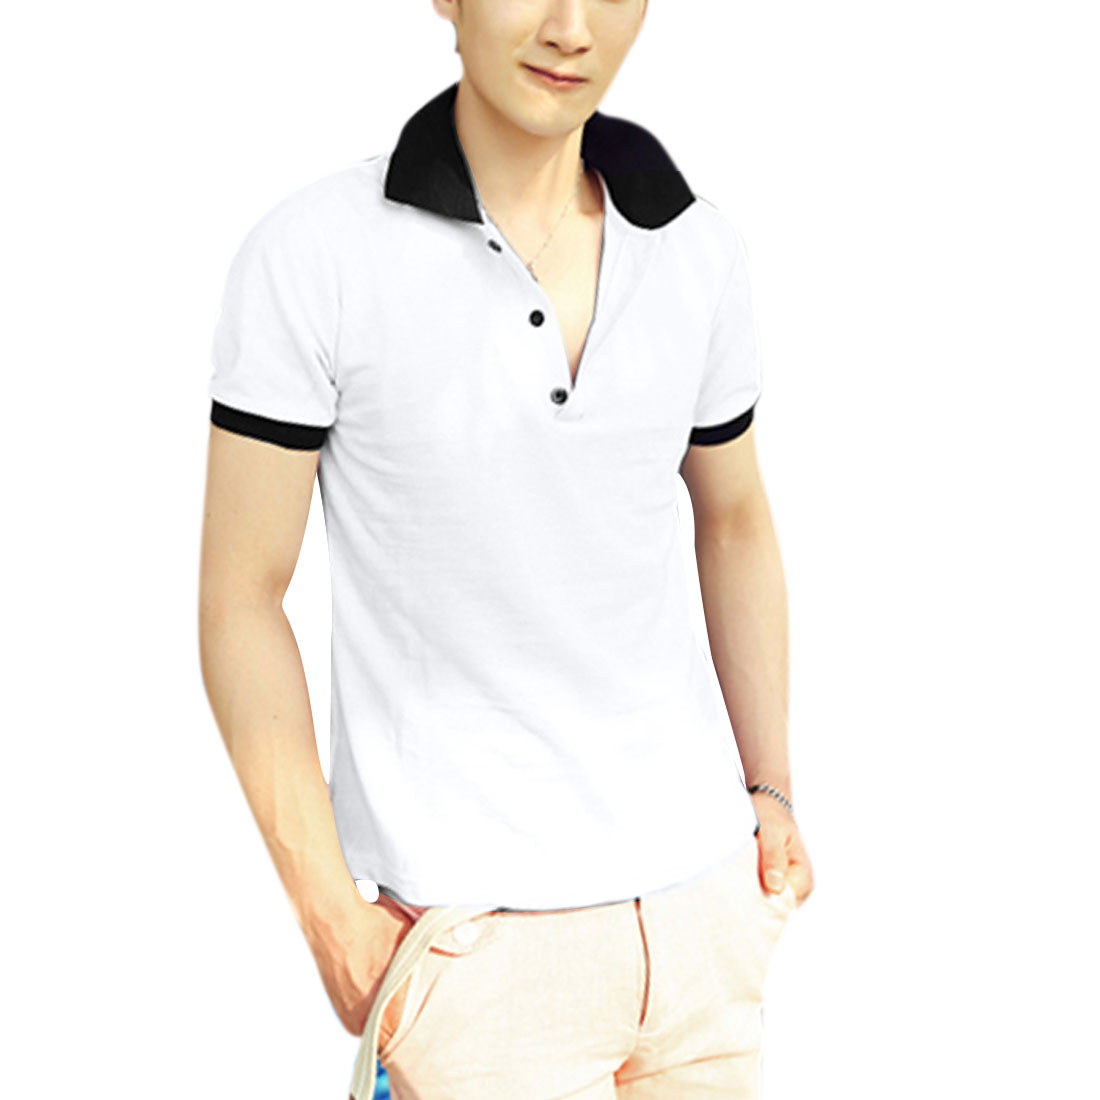 Men Convertible Collar Pullover Ribbing Cuffs Shirt White M